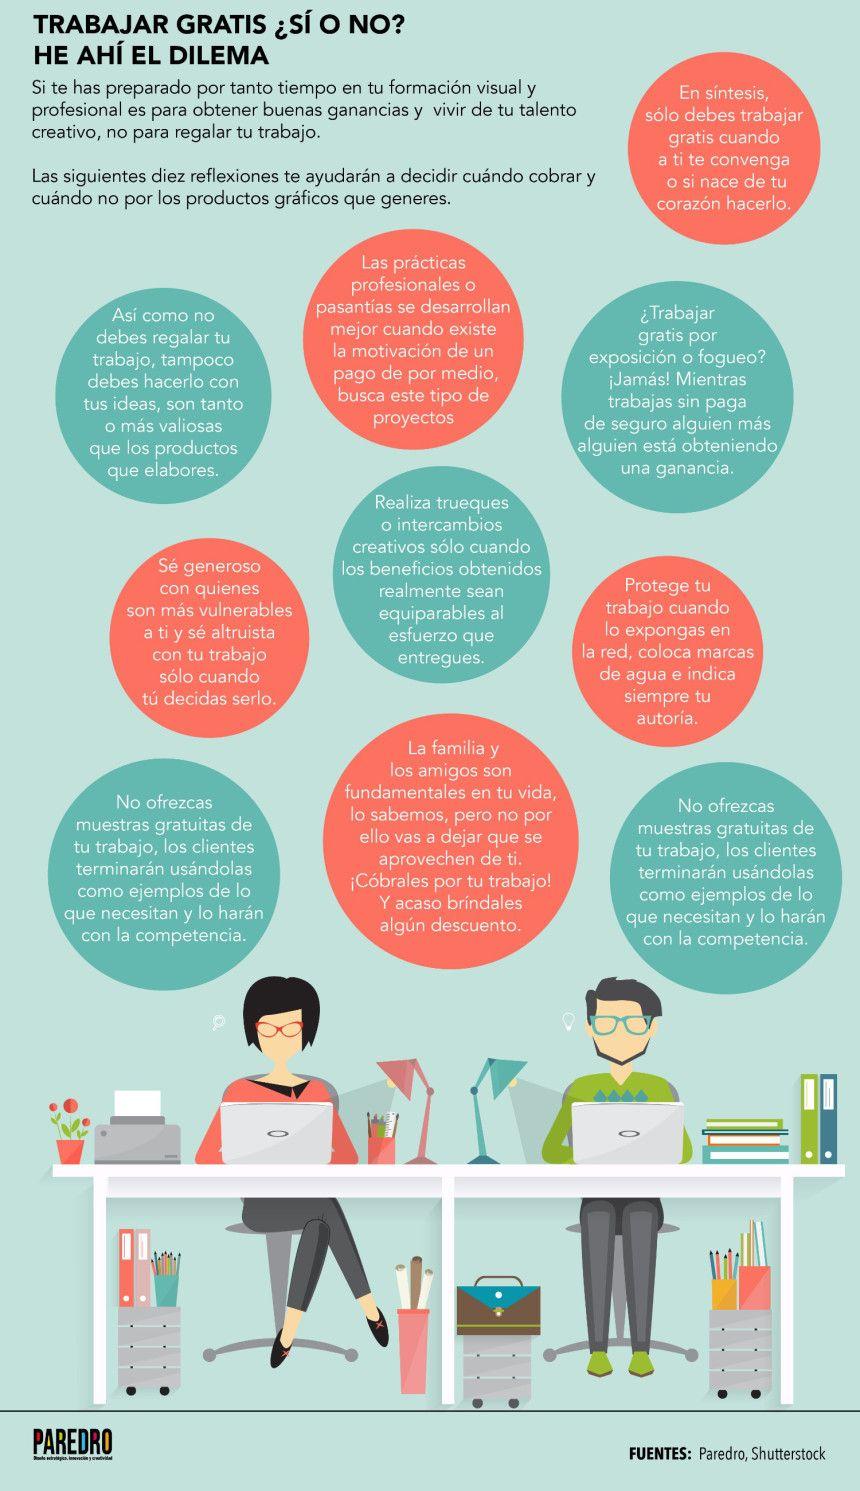 Trabajar Gratis Sí O No He Ahí El Dilema Infografia Infographic Tics Y Formación Dilema Infografia Iniciativa Empresarial